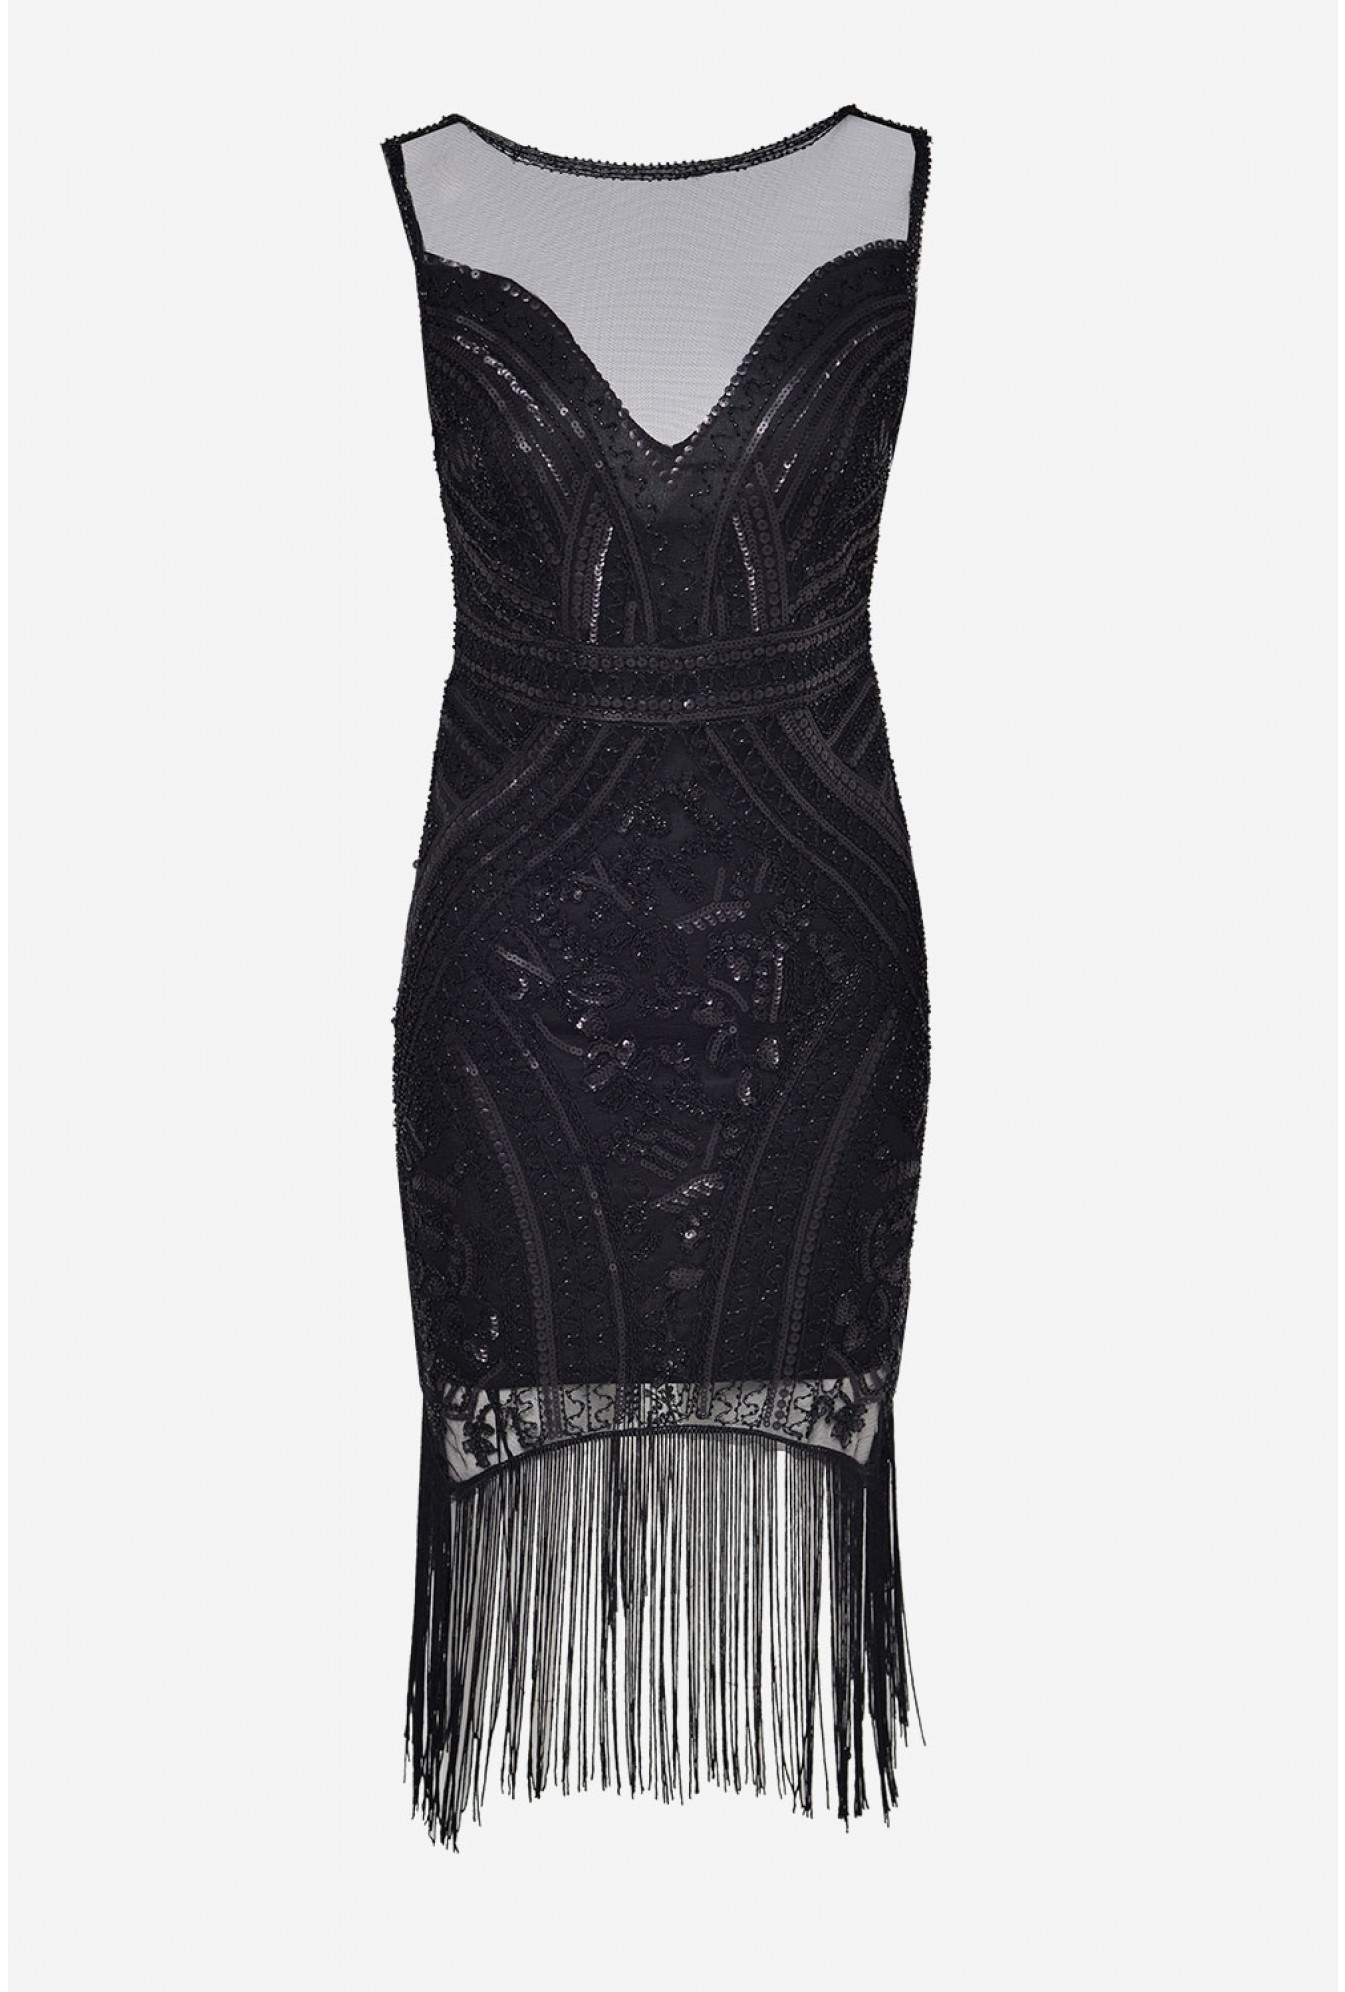 8de7ee1069 More Views. Jean Fringe and Sequin Dress in Black